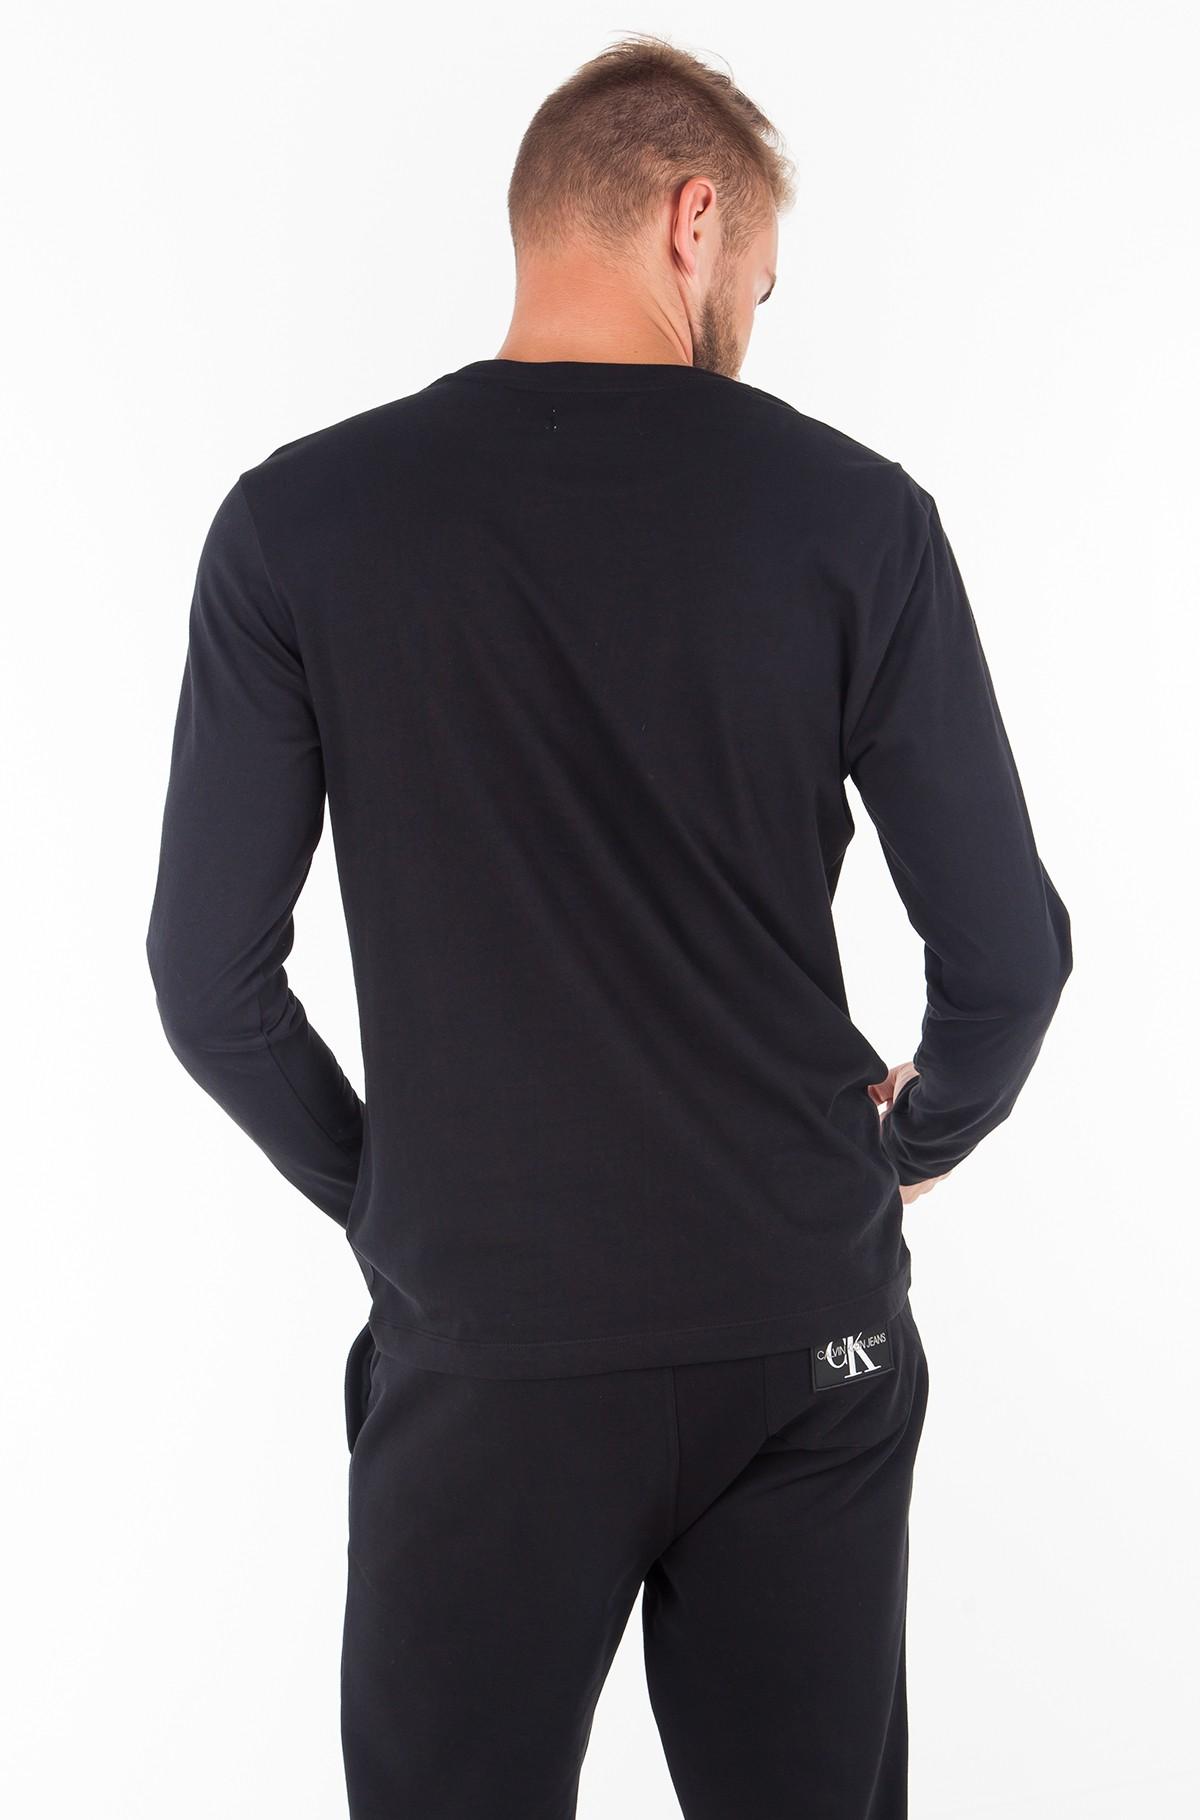 T-krekls ar garām piedurknēm  MONOGRAM BOX LOGO COTTON LONG SLEEVE TEE-full-2